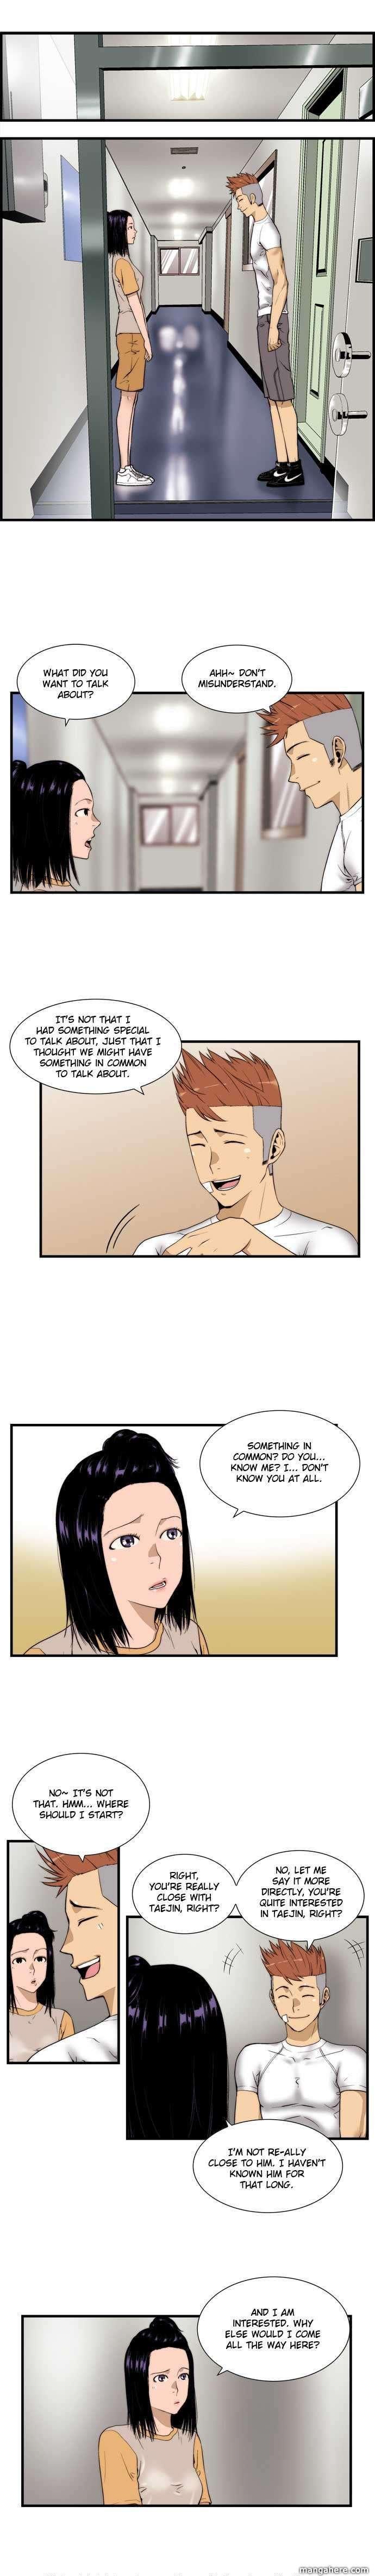 Green Boy 20 Page 1